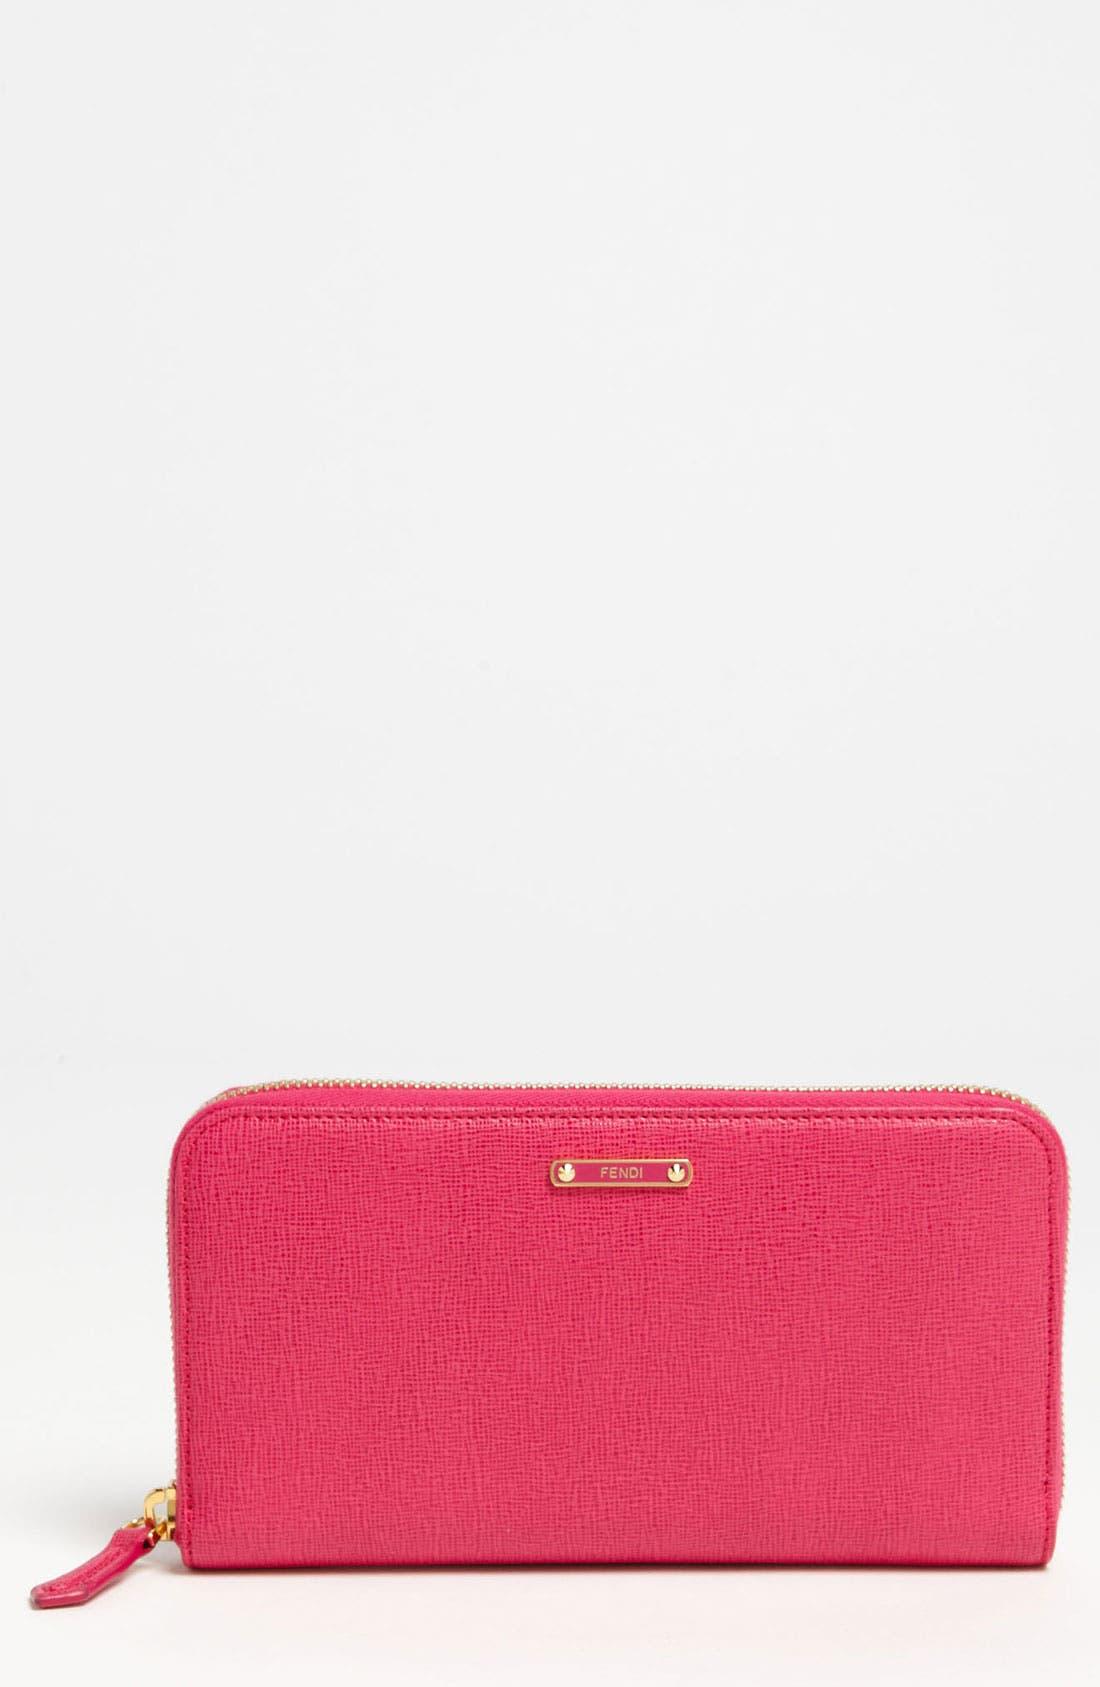 Main Image - Fendi 'Crayons' Leather Wallet